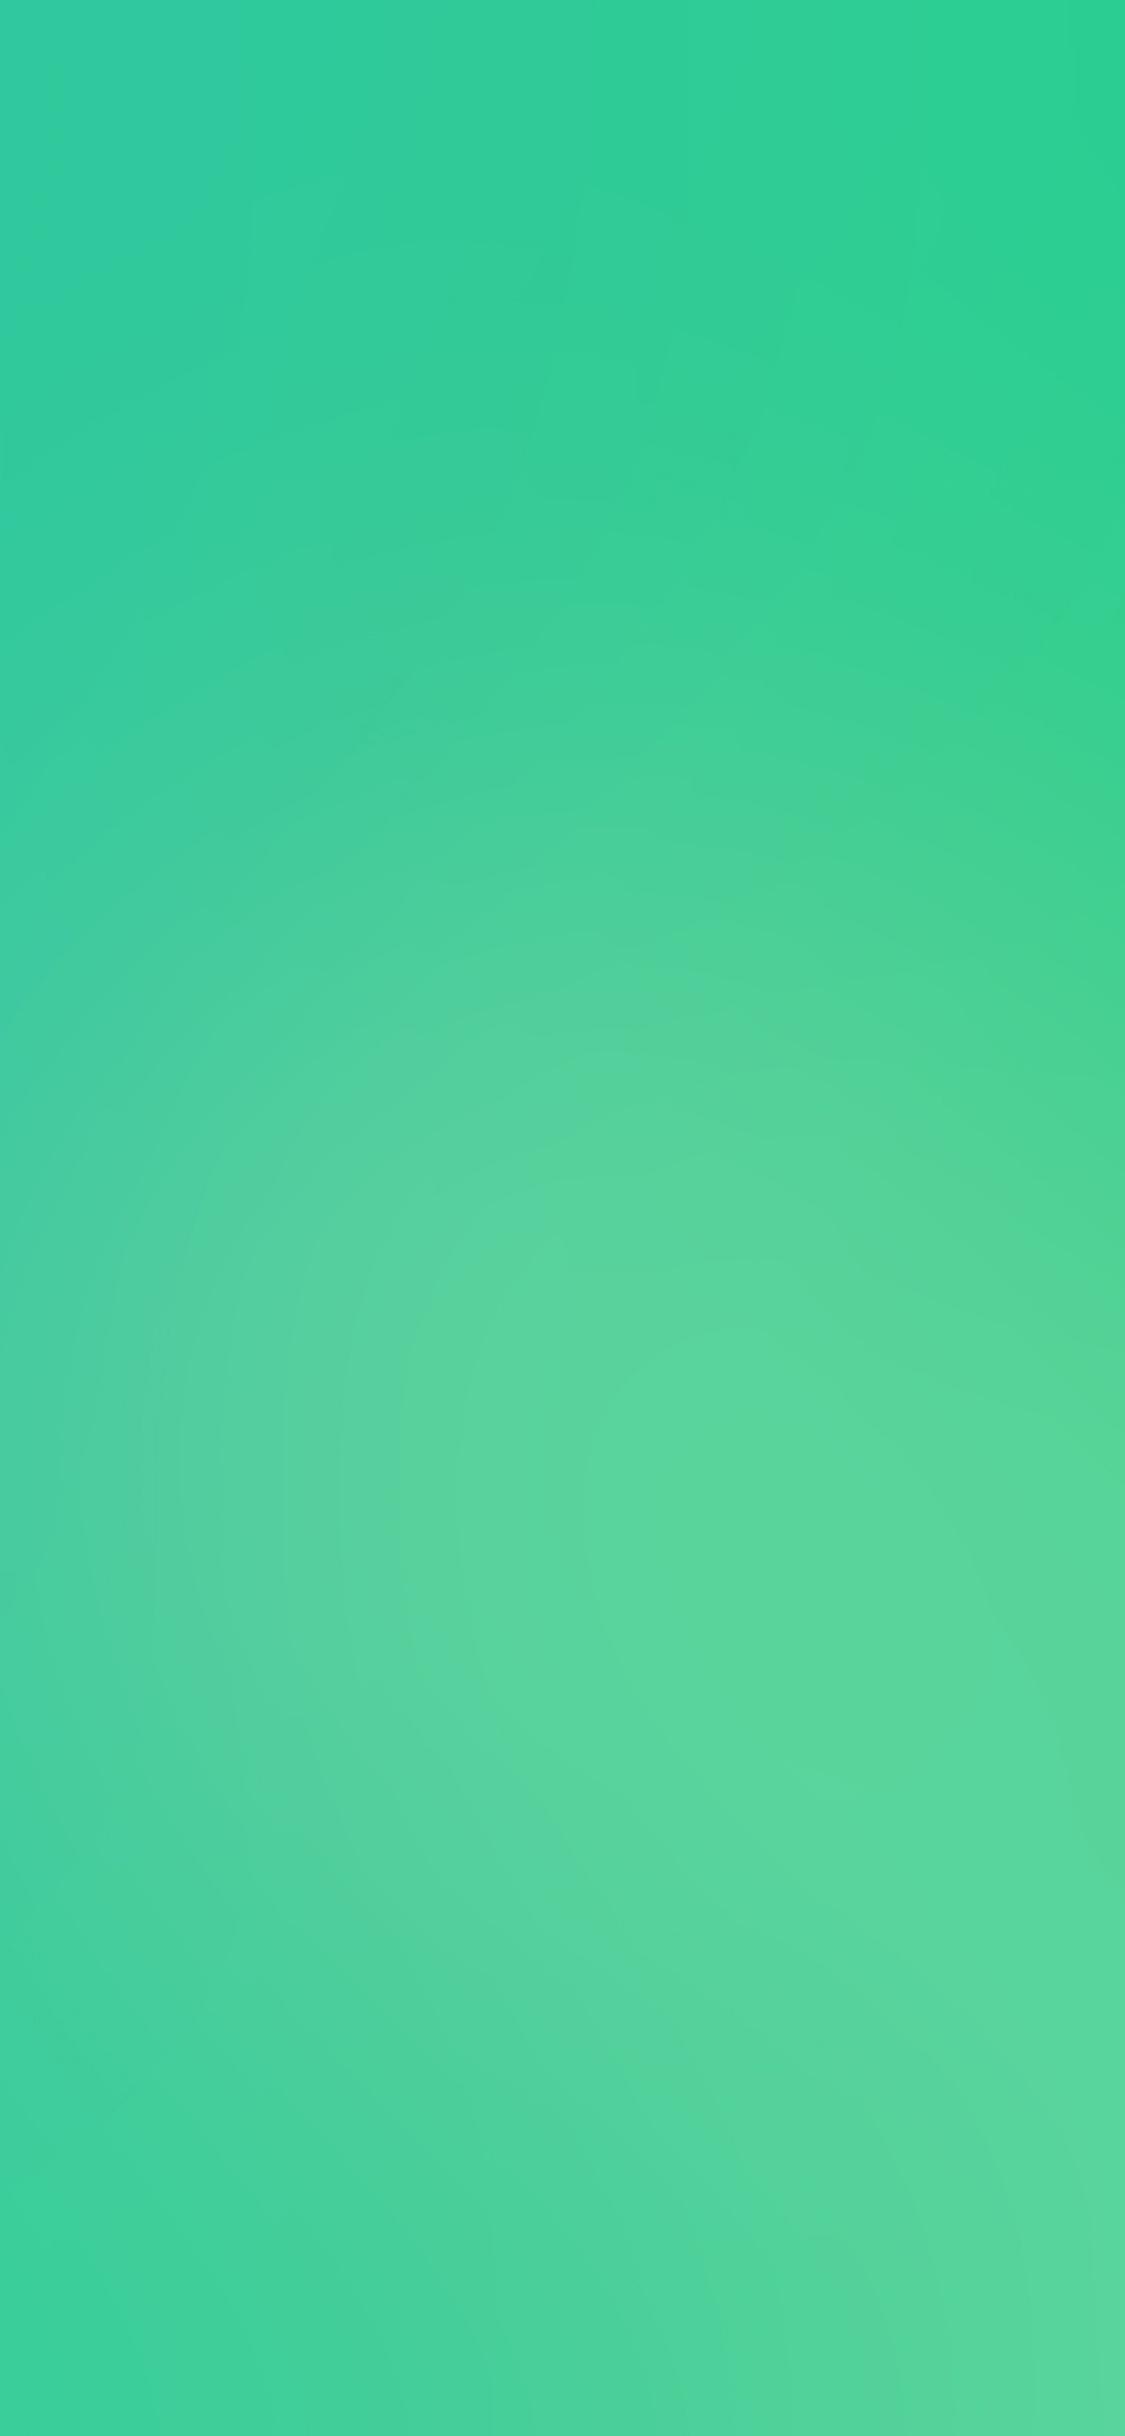 iPhoneXpapers.com-Apple-iPhone-wallpaper-sc34-just-neon-blue-green-blur